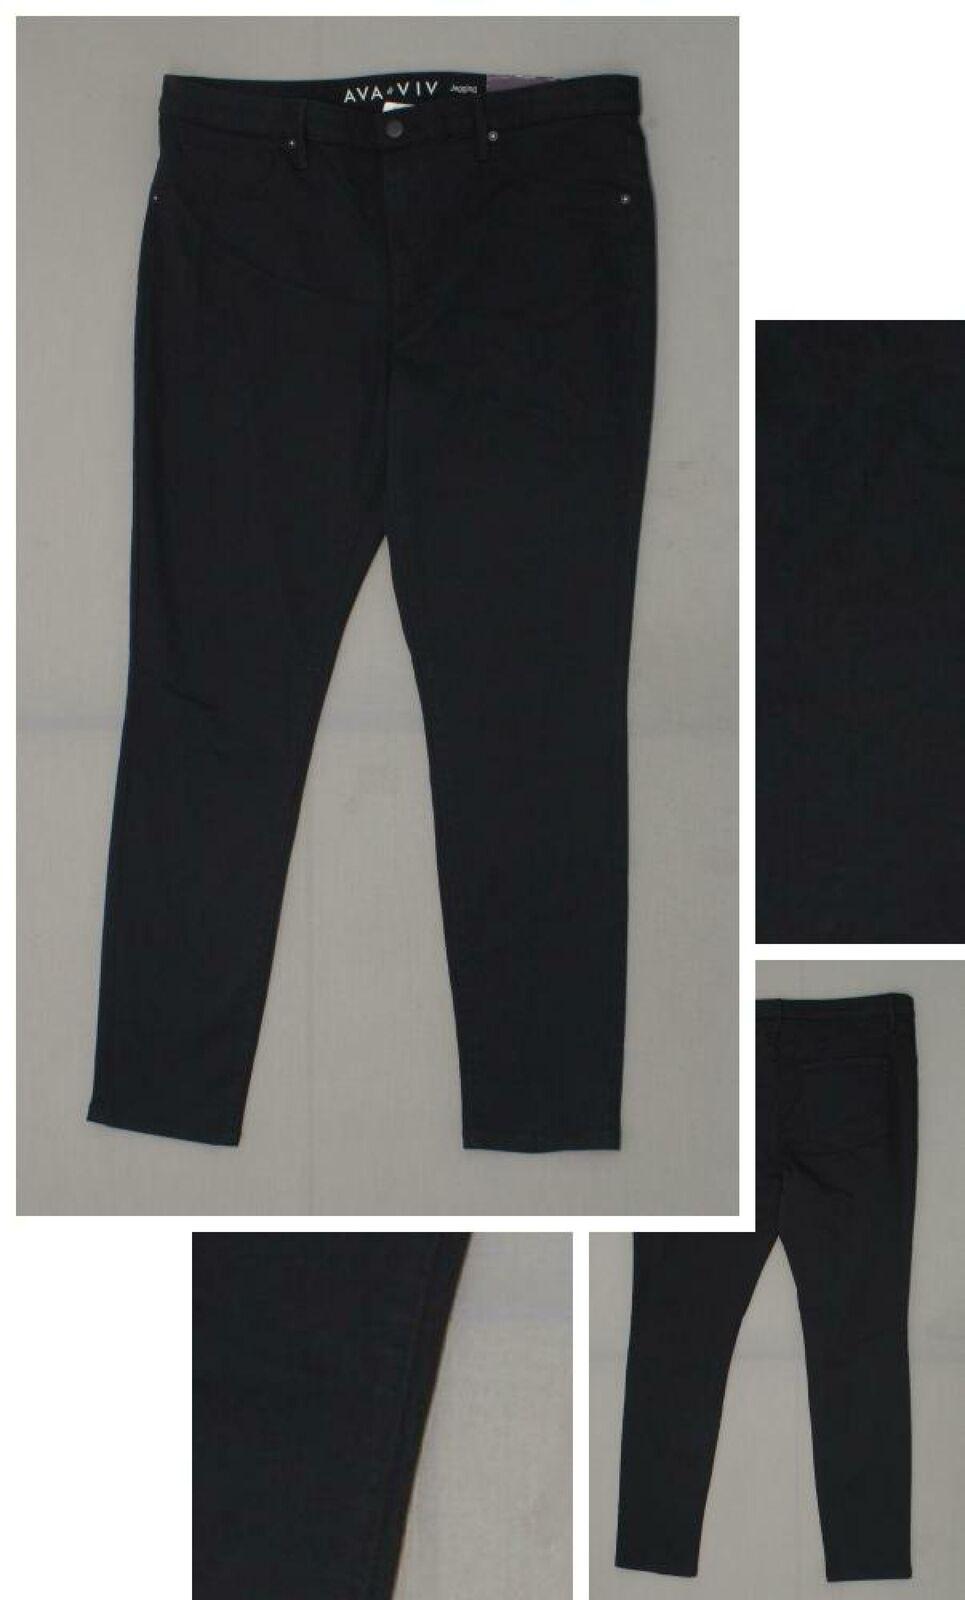 7fd44a7bddc879 NWT Ava & Viv Women's Plus Size Black Super Stretch Denim Jeggings ...